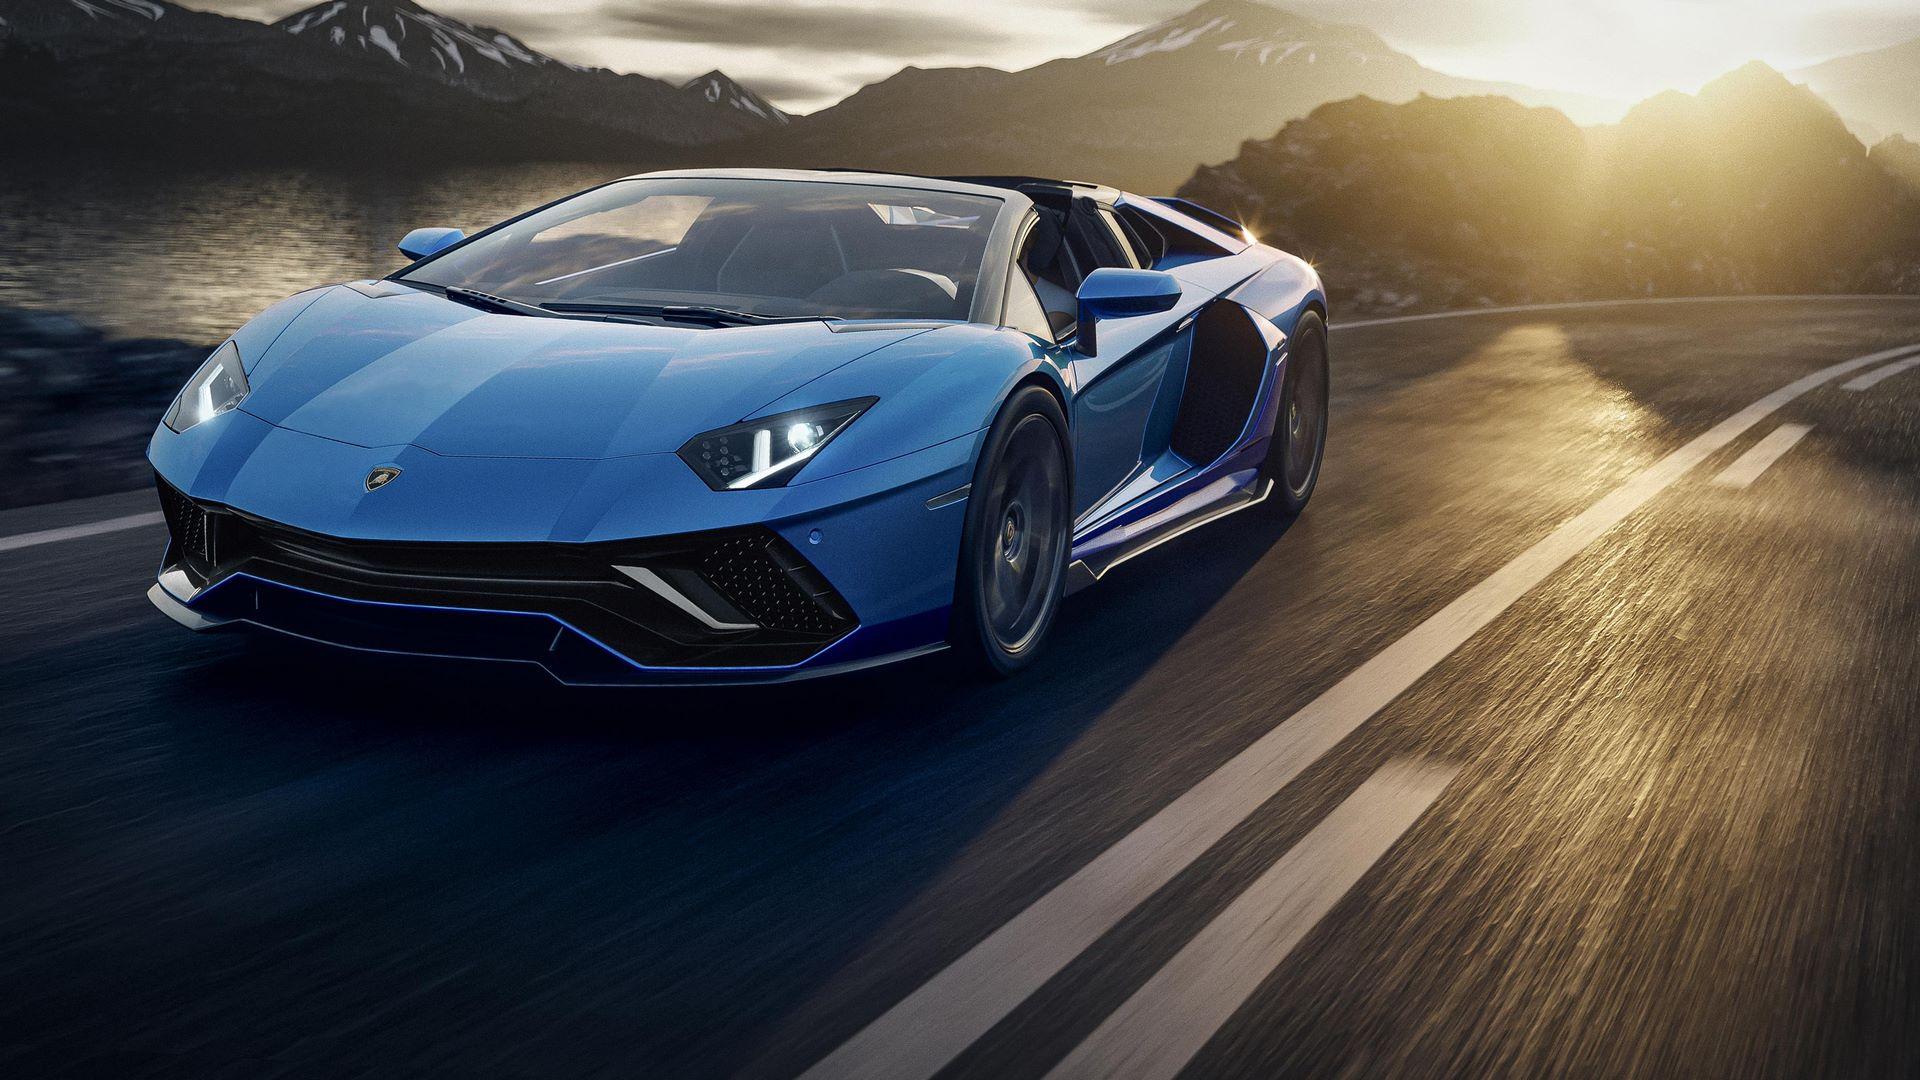 Lamborghini-Aventador-LP780-4-Ultimae-18